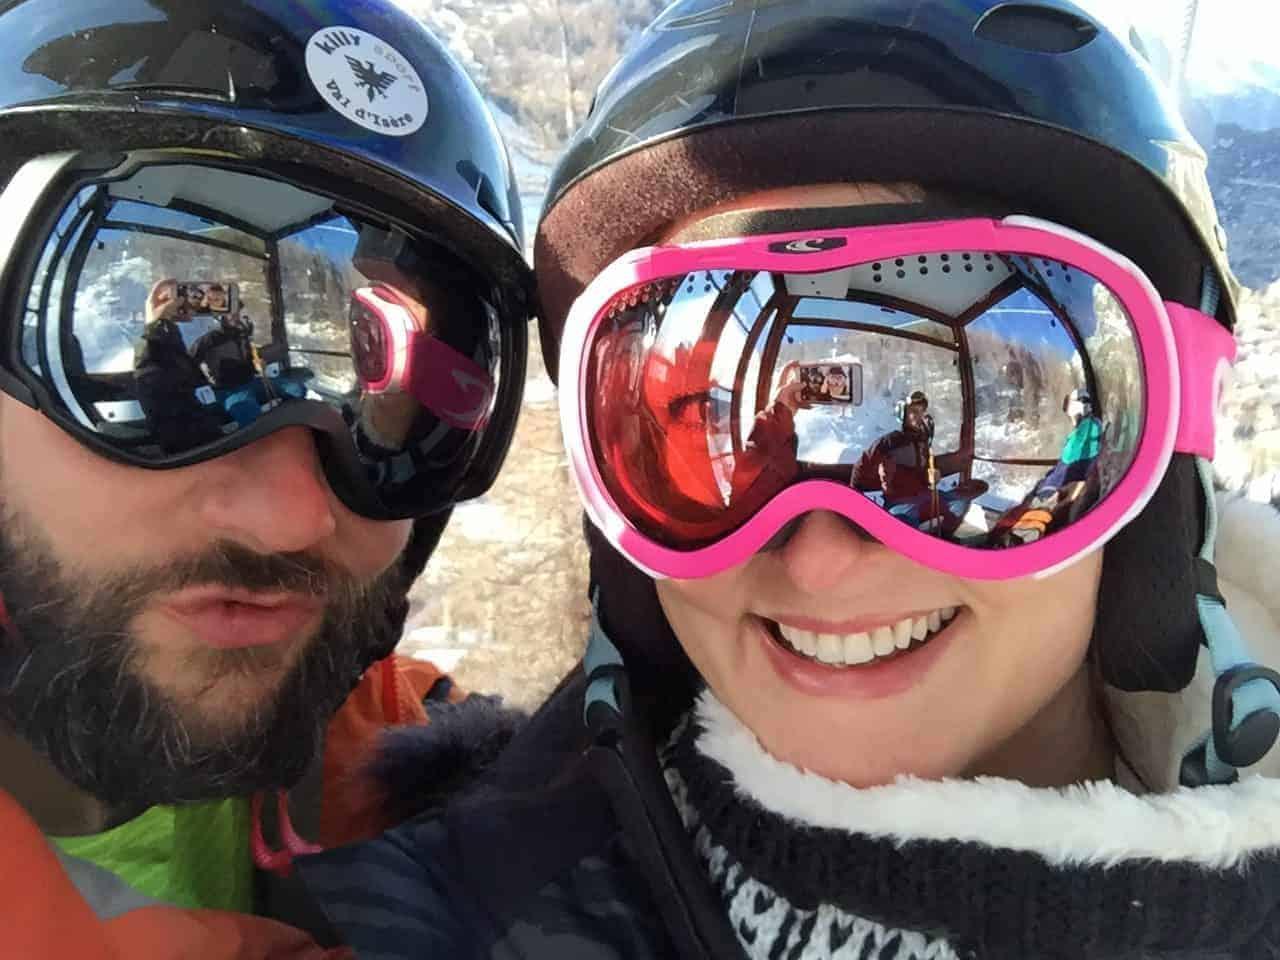 Couple on a ski holiday wearing ski goggles